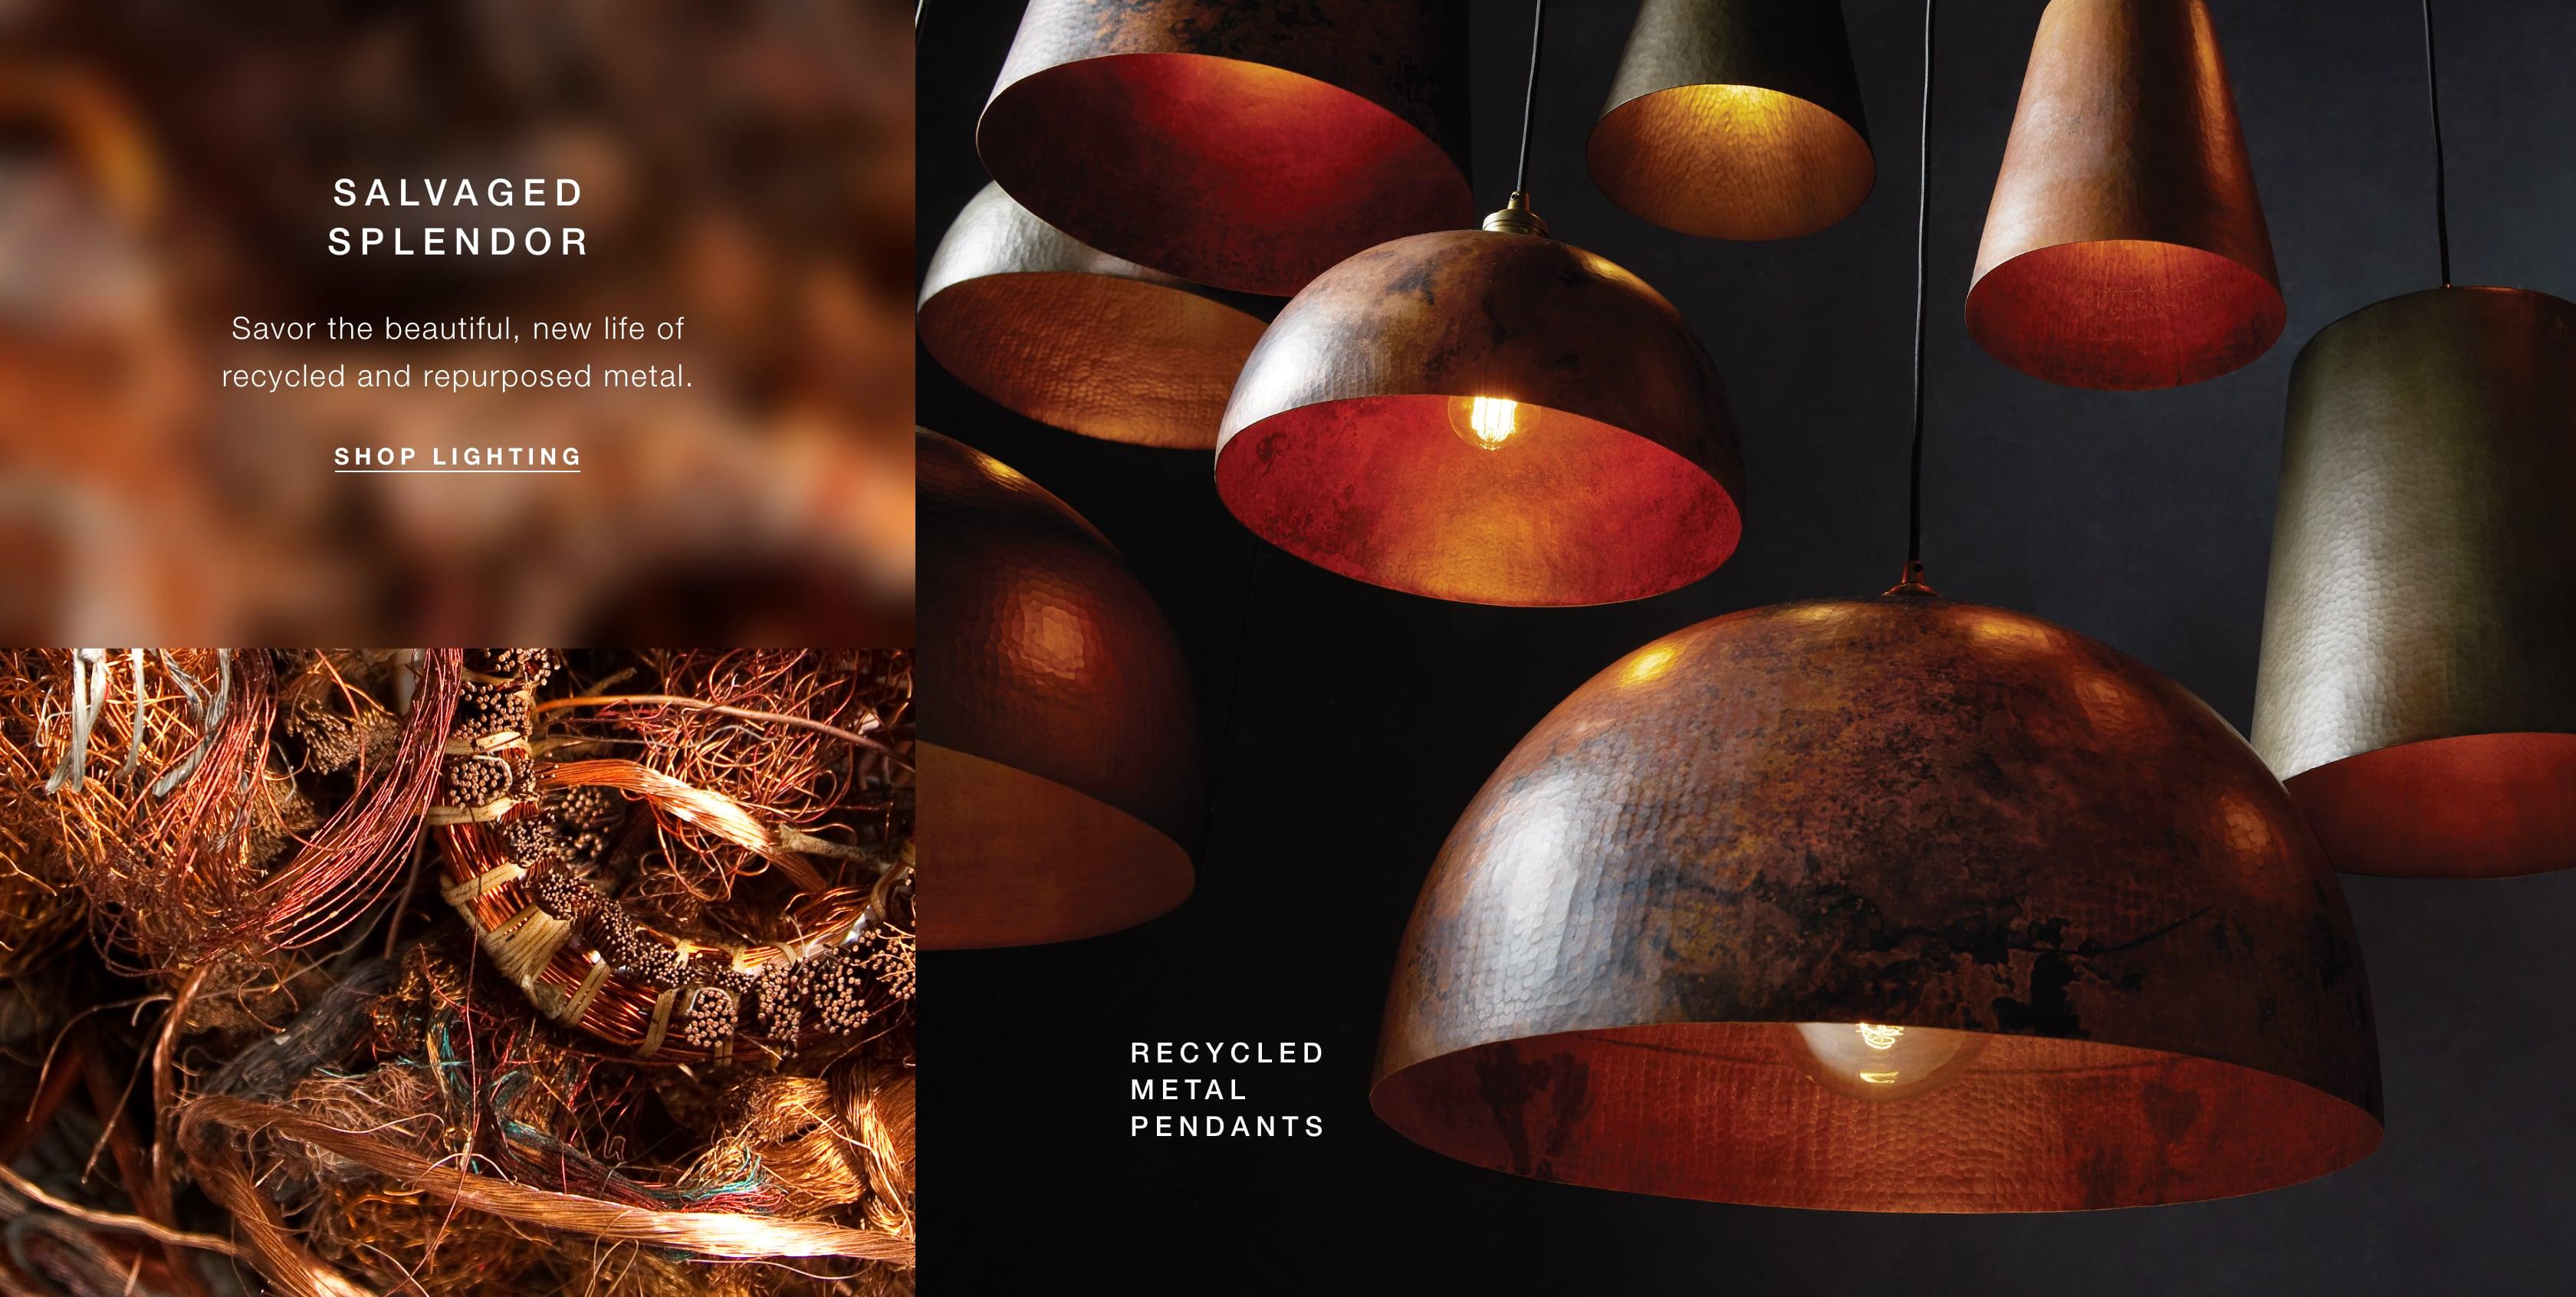 Shop Lighting, Including Recycled Metal Pendants